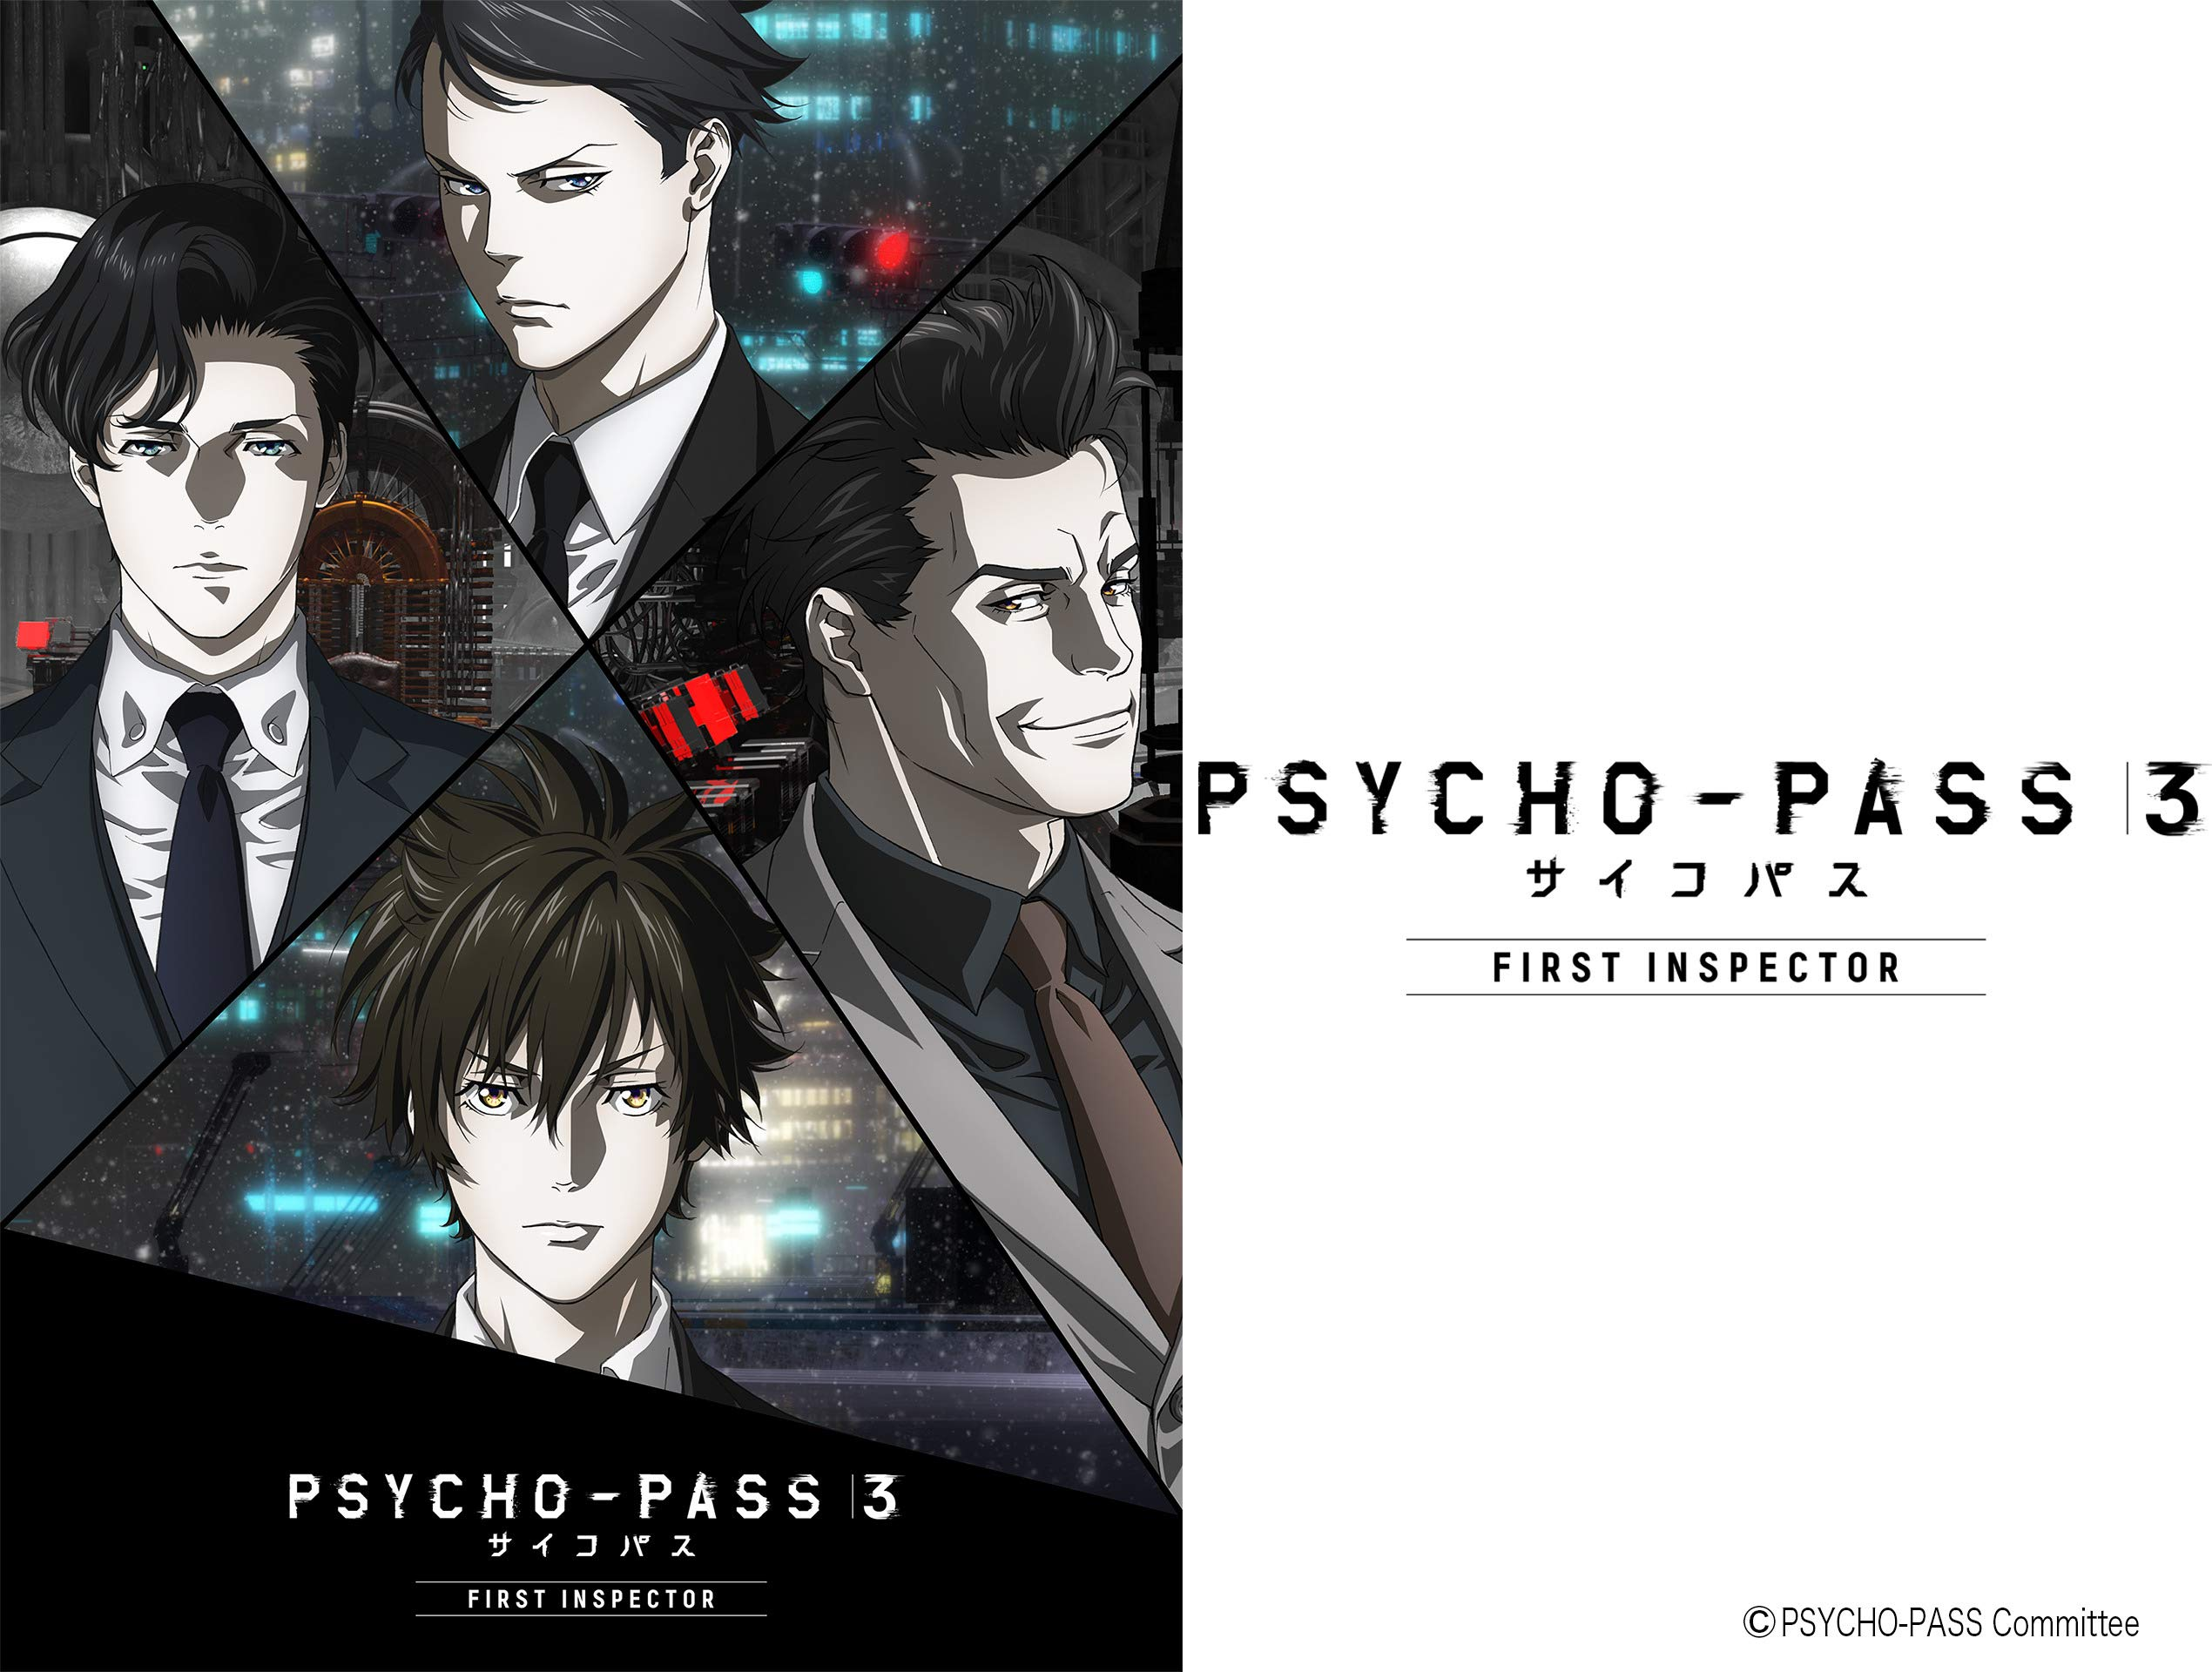 Watch Psycho Pass 3 First Inspector Prime Video